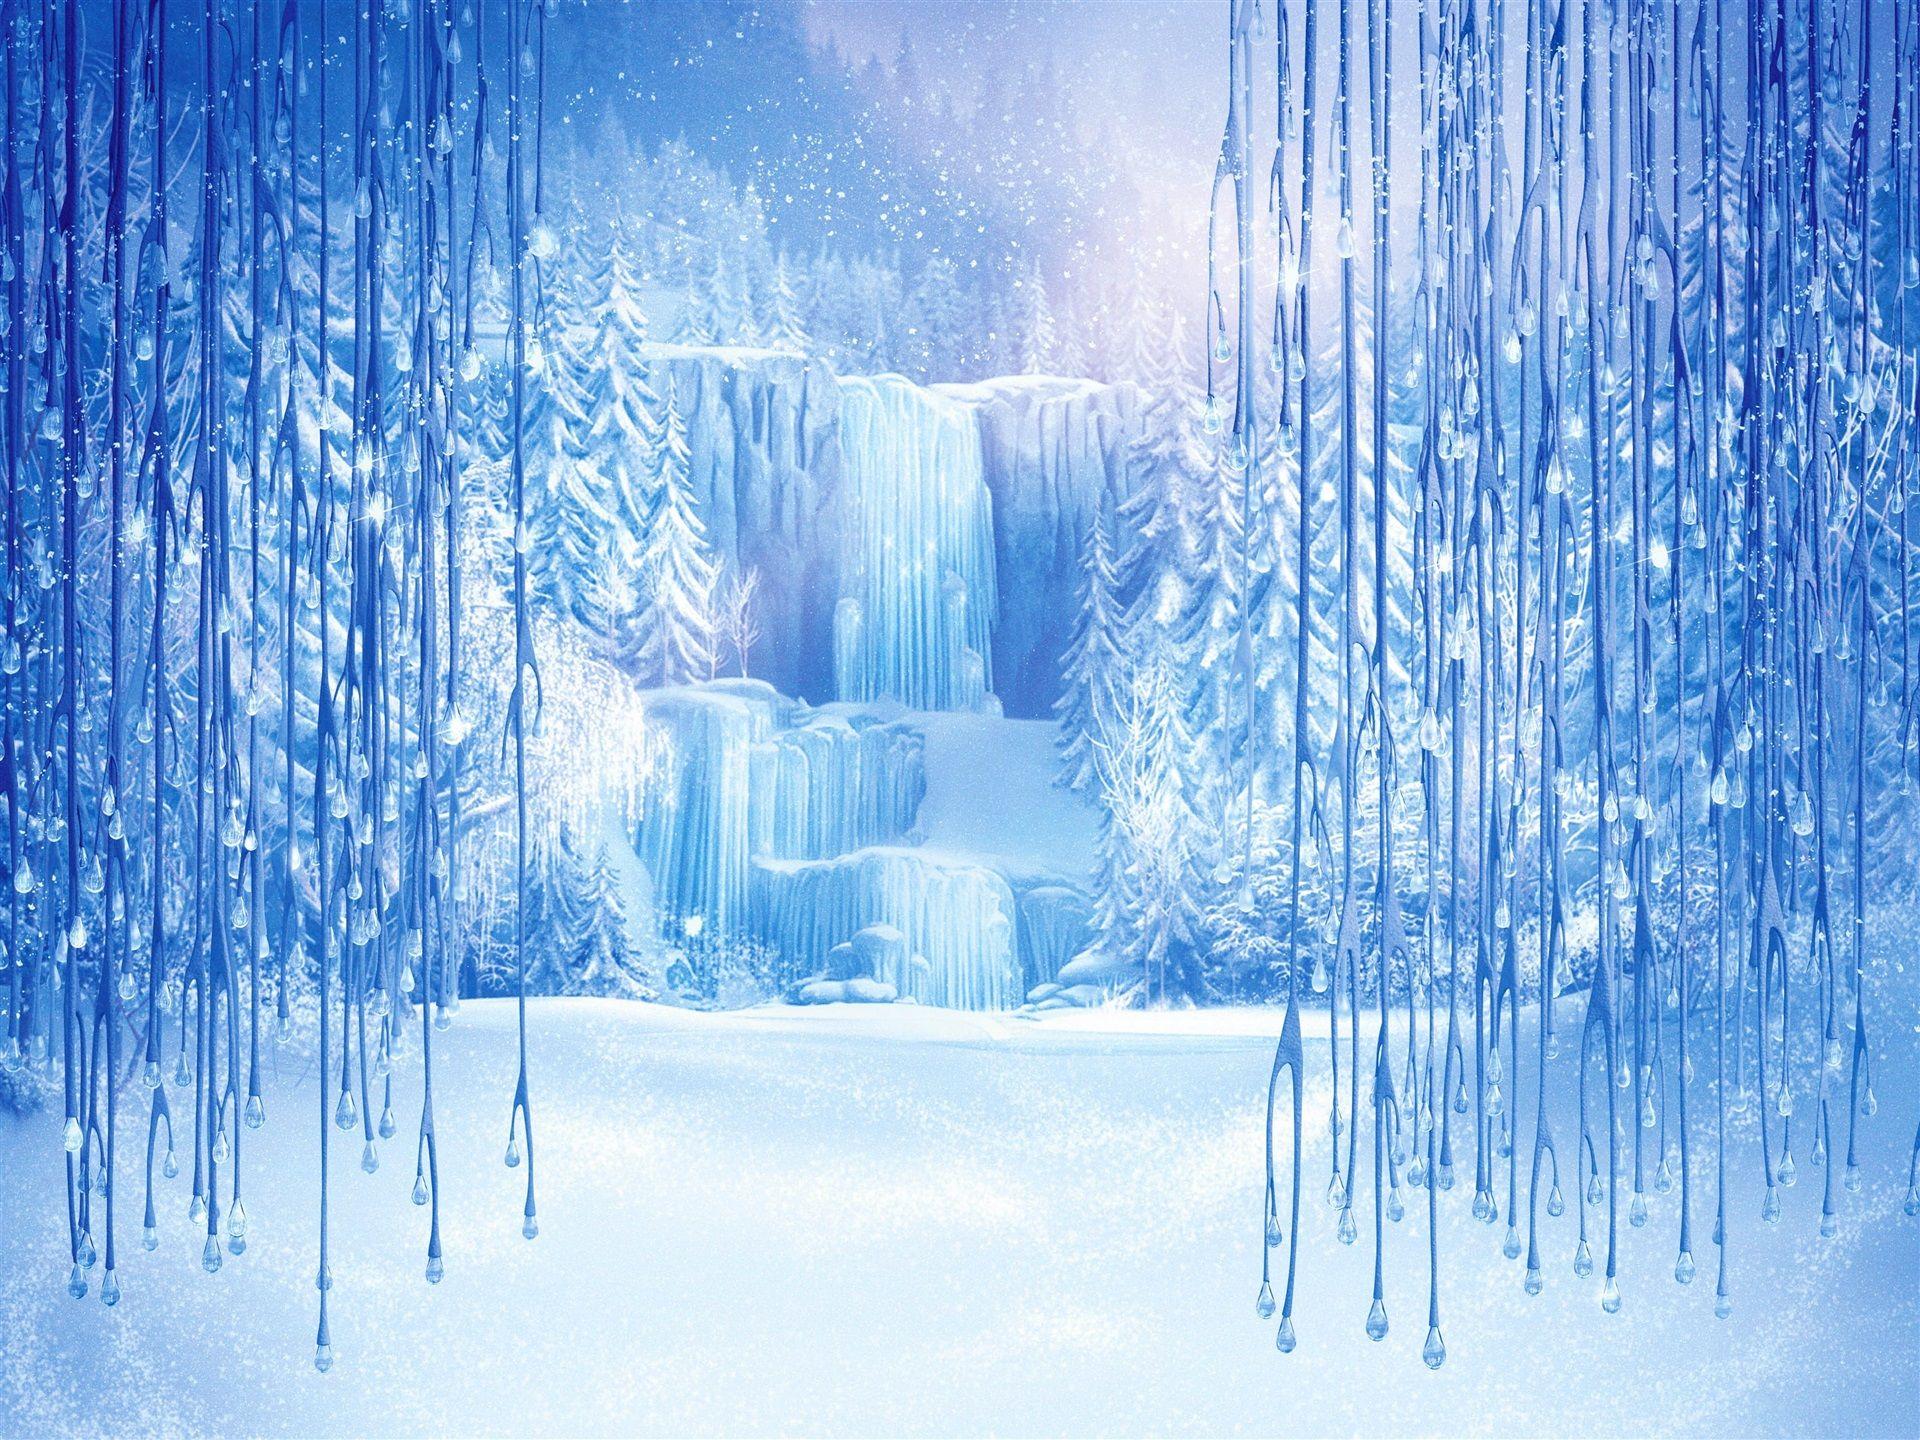 Ultra Hd Wallpaper Ice Castle Ice Castle Arendelle Cold Heart